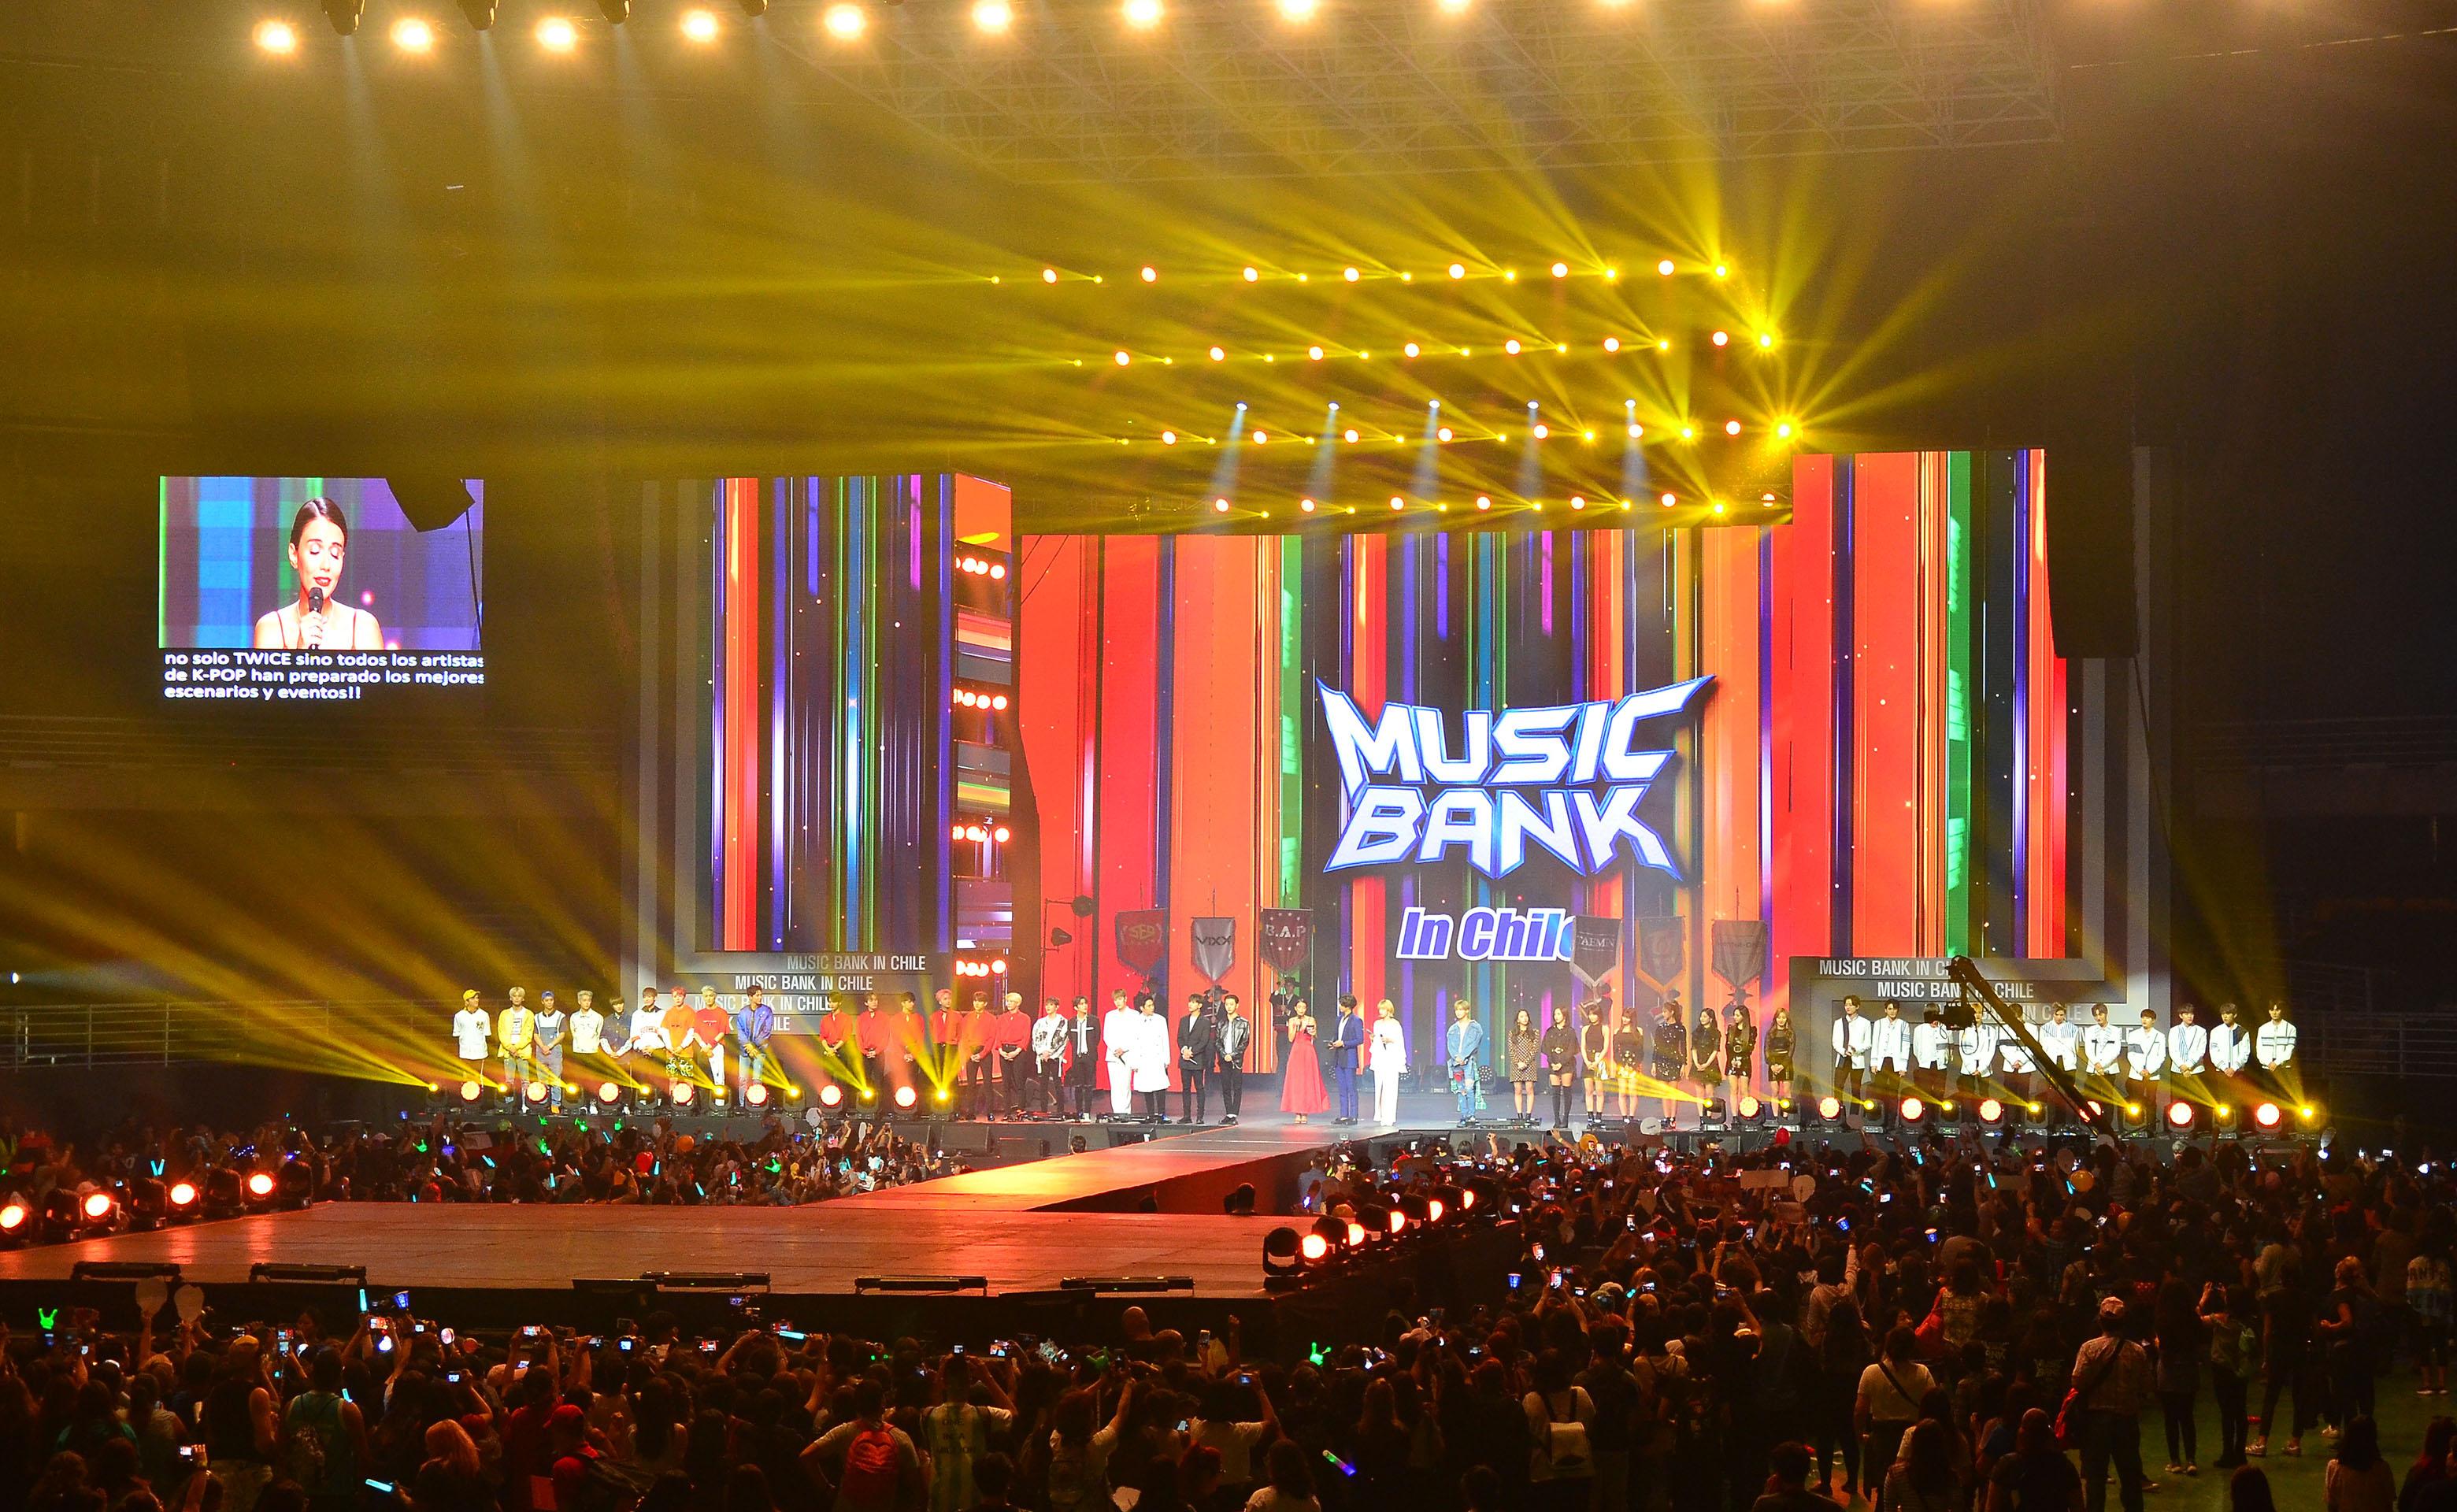 Music Bank Latino America (OFICIAL) [02/11/12] - Página 3 DCS_0985